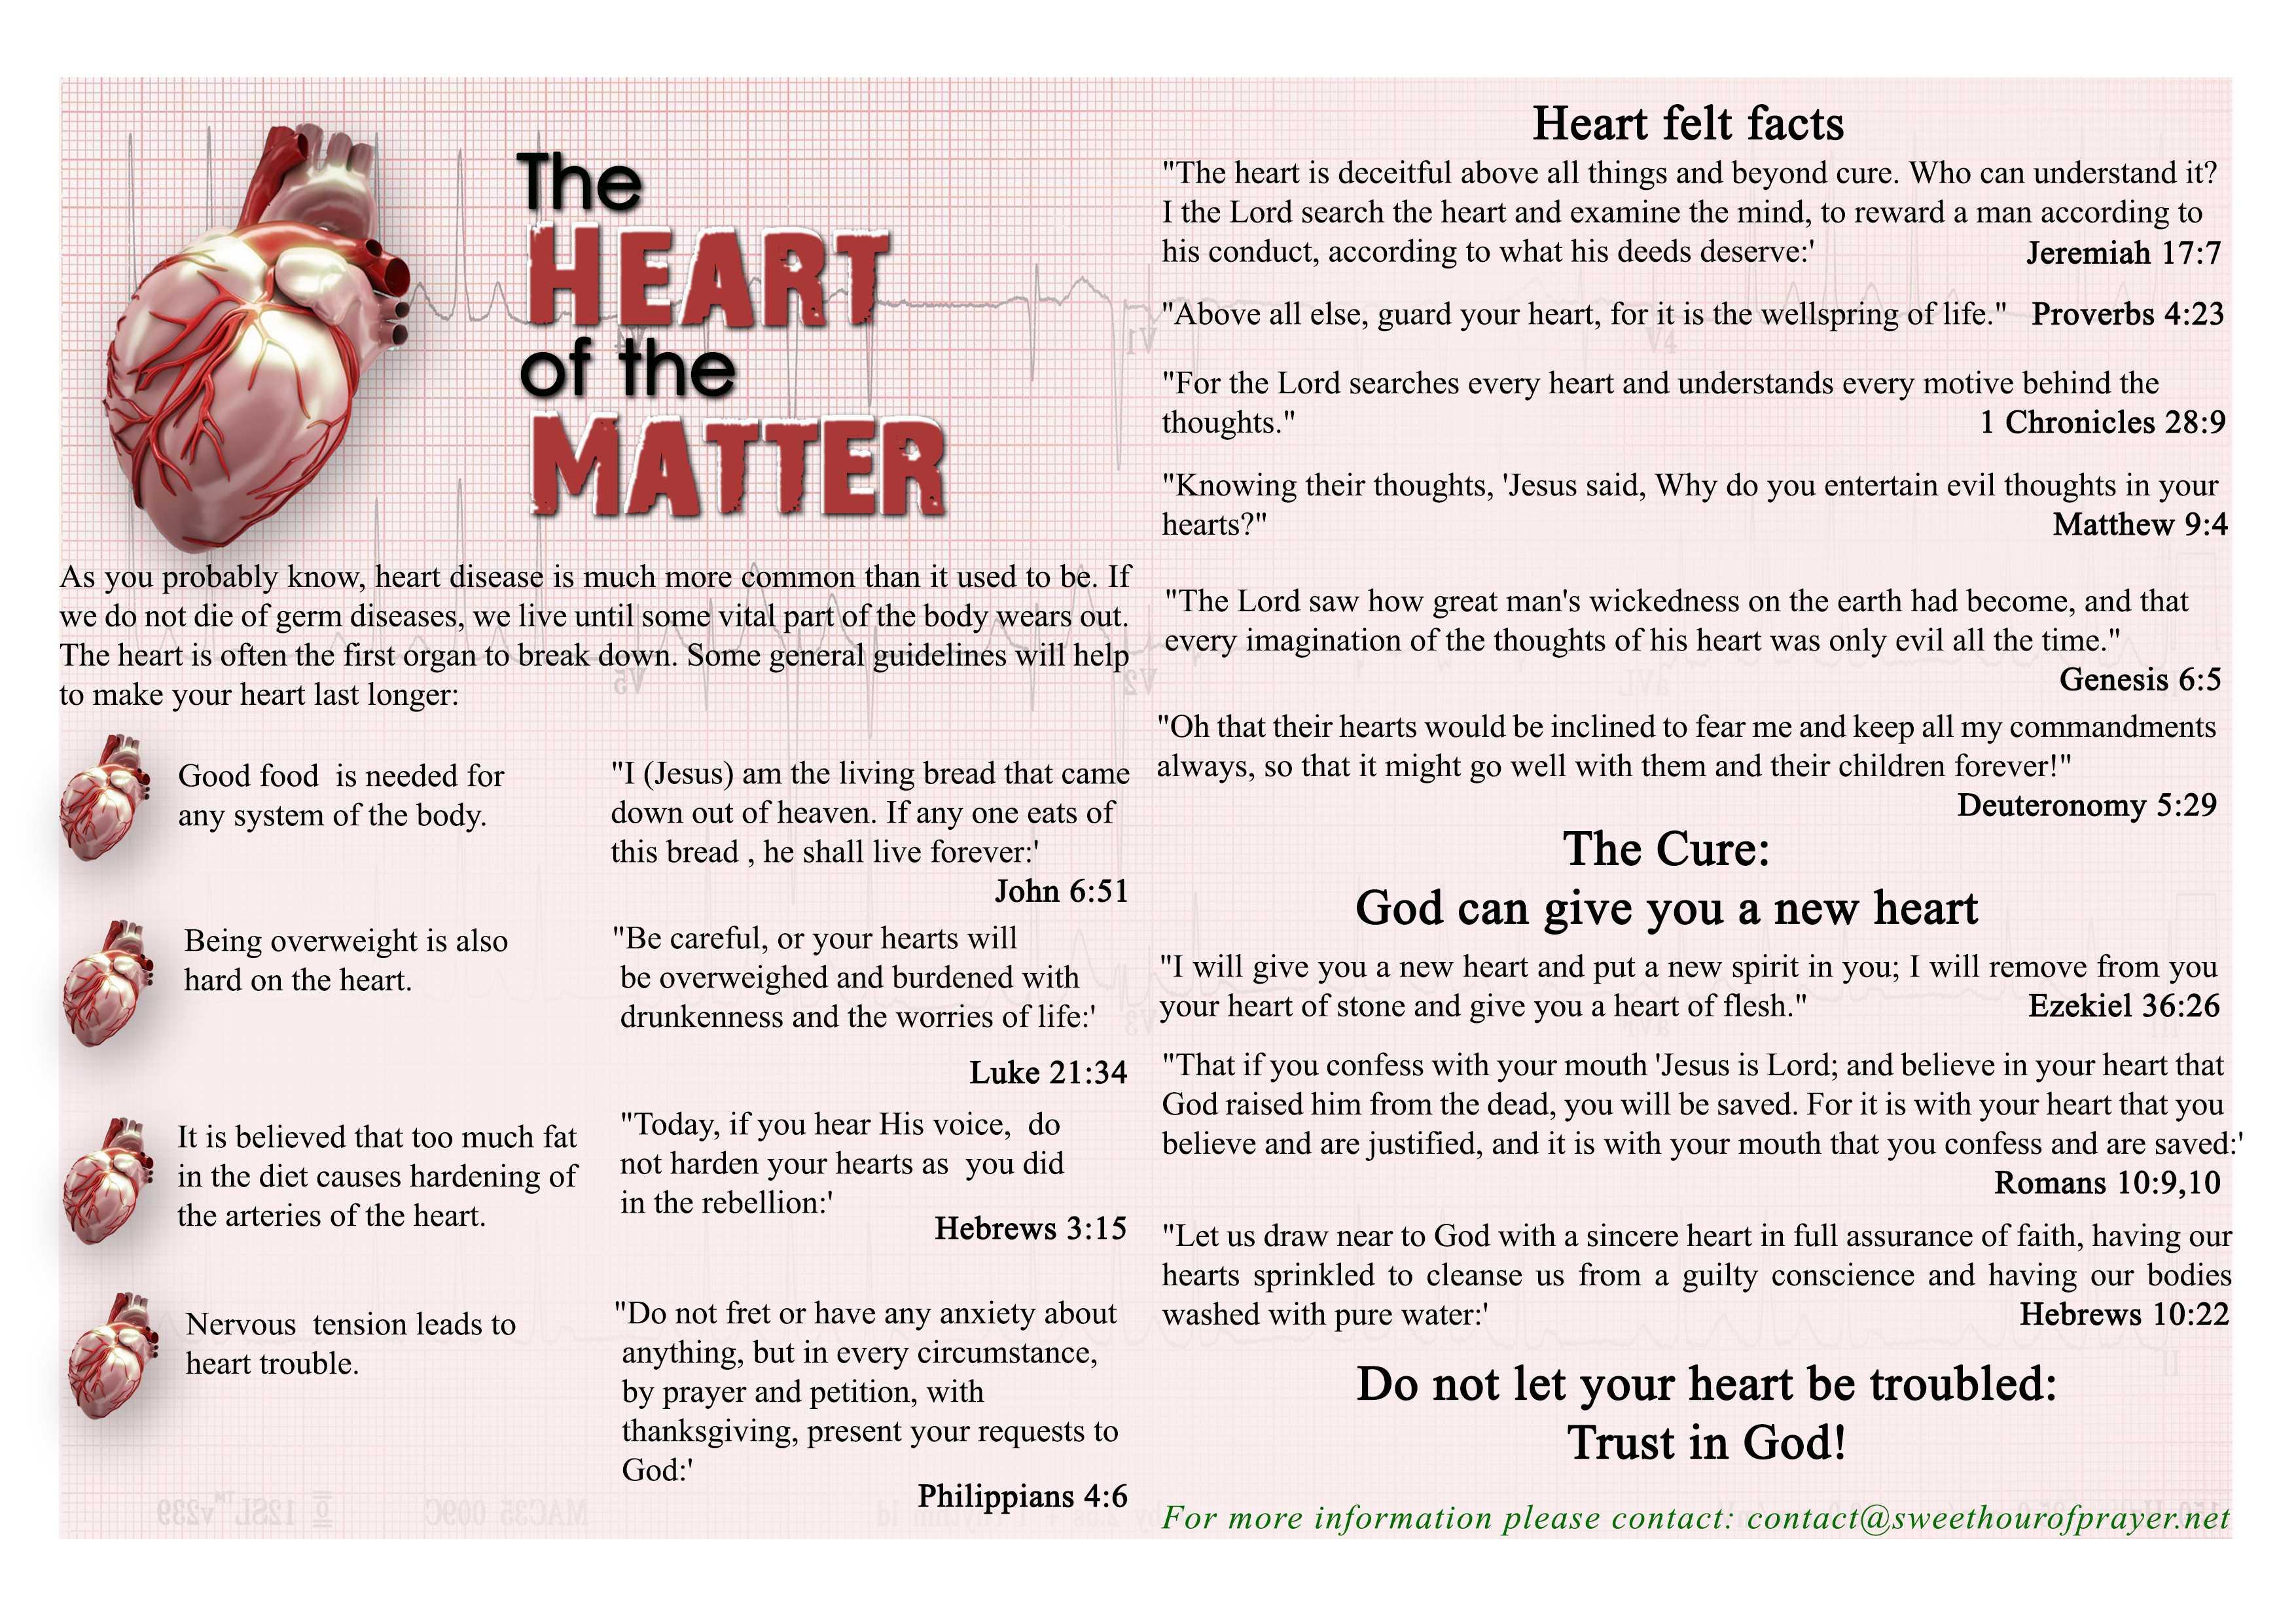 Heartofthematter (2)